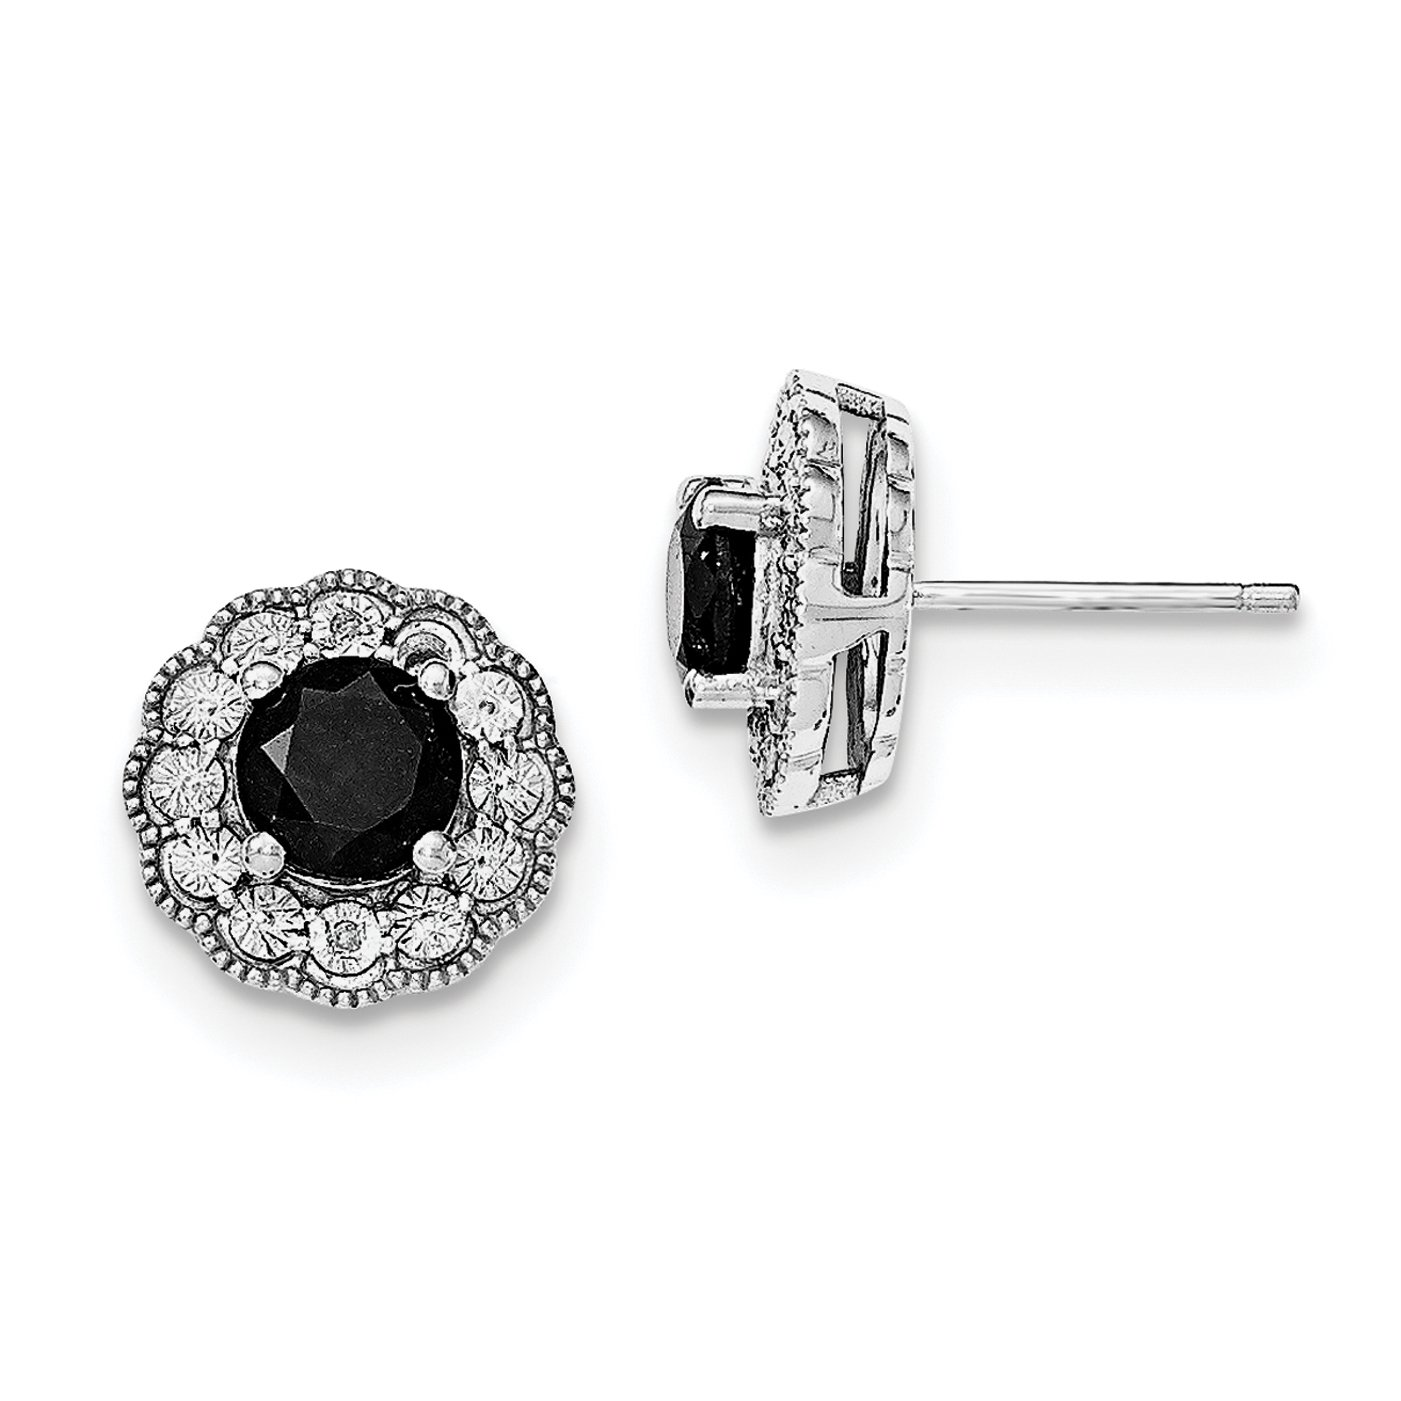 ICE CARATS 925 Sterling Silver Black Sapphire Diamond Post Stud Ball Button Earrings Fine Jewelry Gift Set For Women Heart